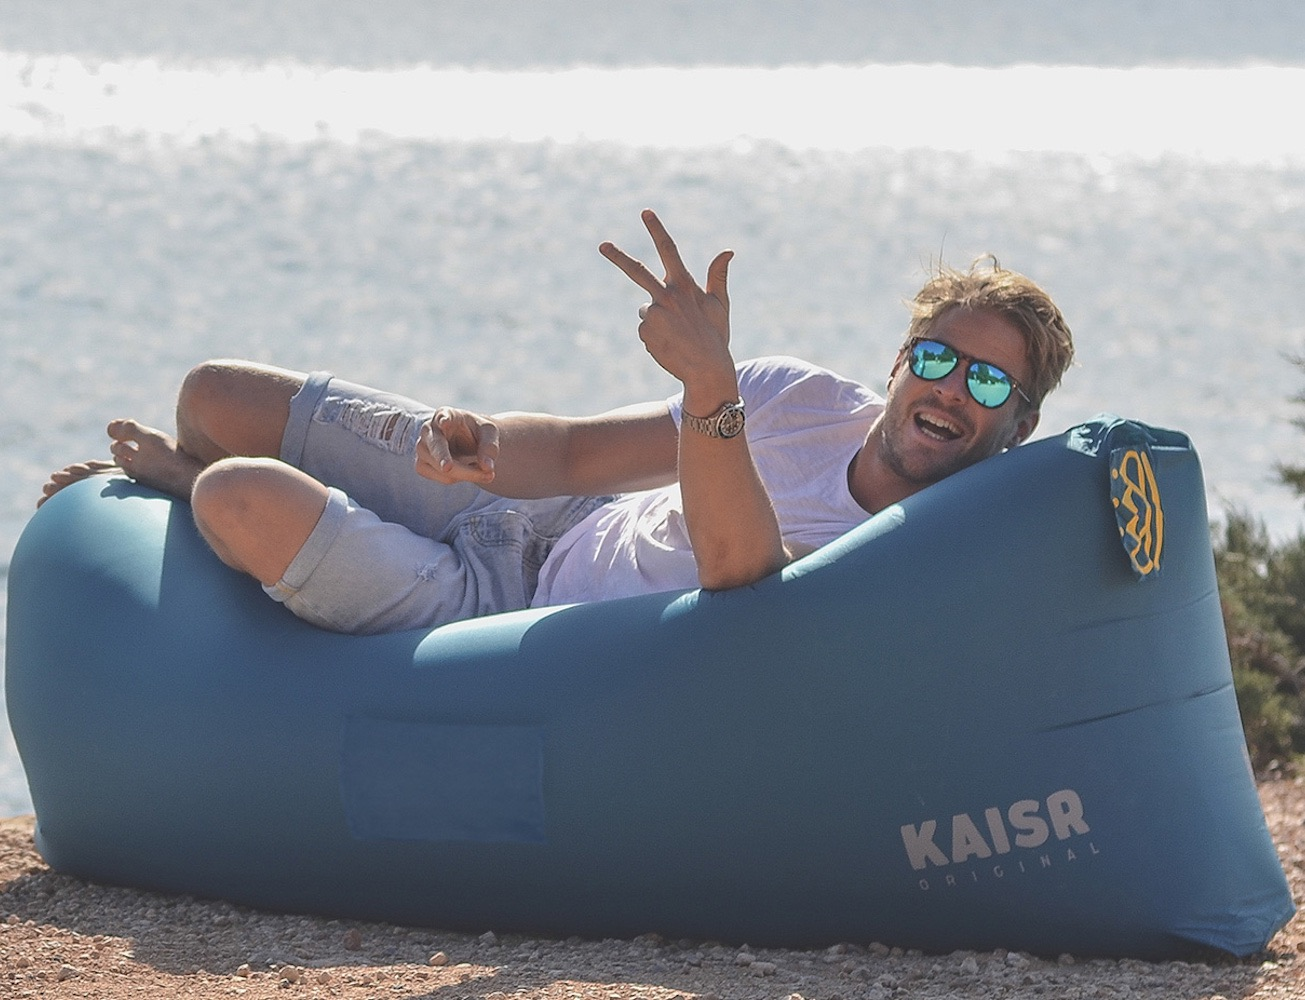 Kaisr – Inflatable Air Lounge